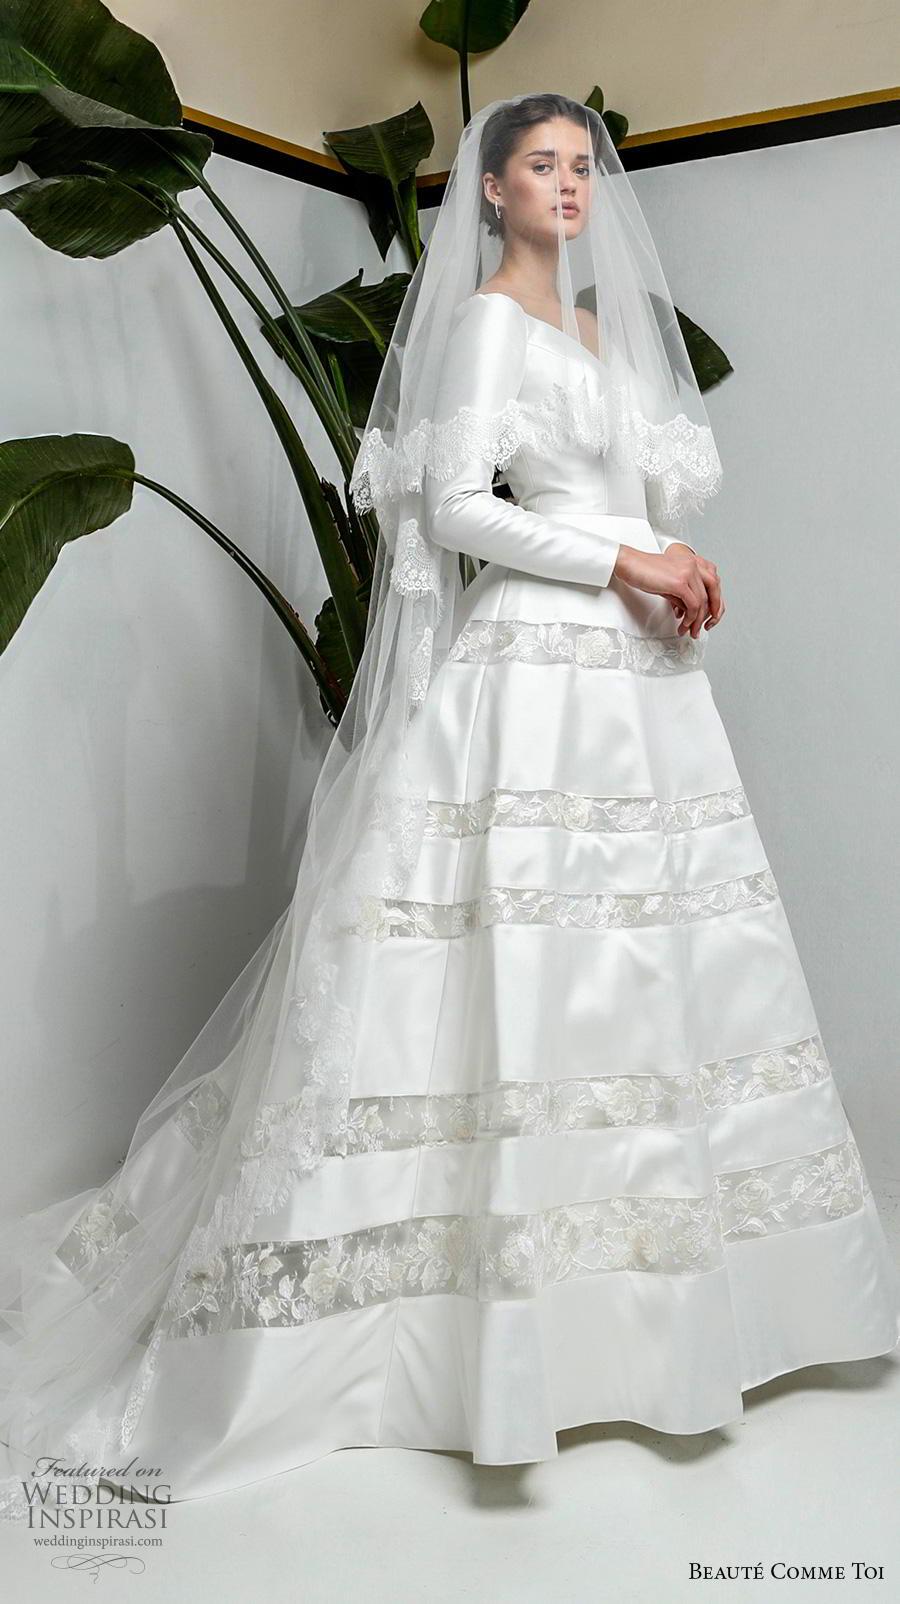 beaute comme toi 2019 bridal long sleeves v neck simple light embellished skirt elegant classy a  line wedding dress chapel train (lisle) mv